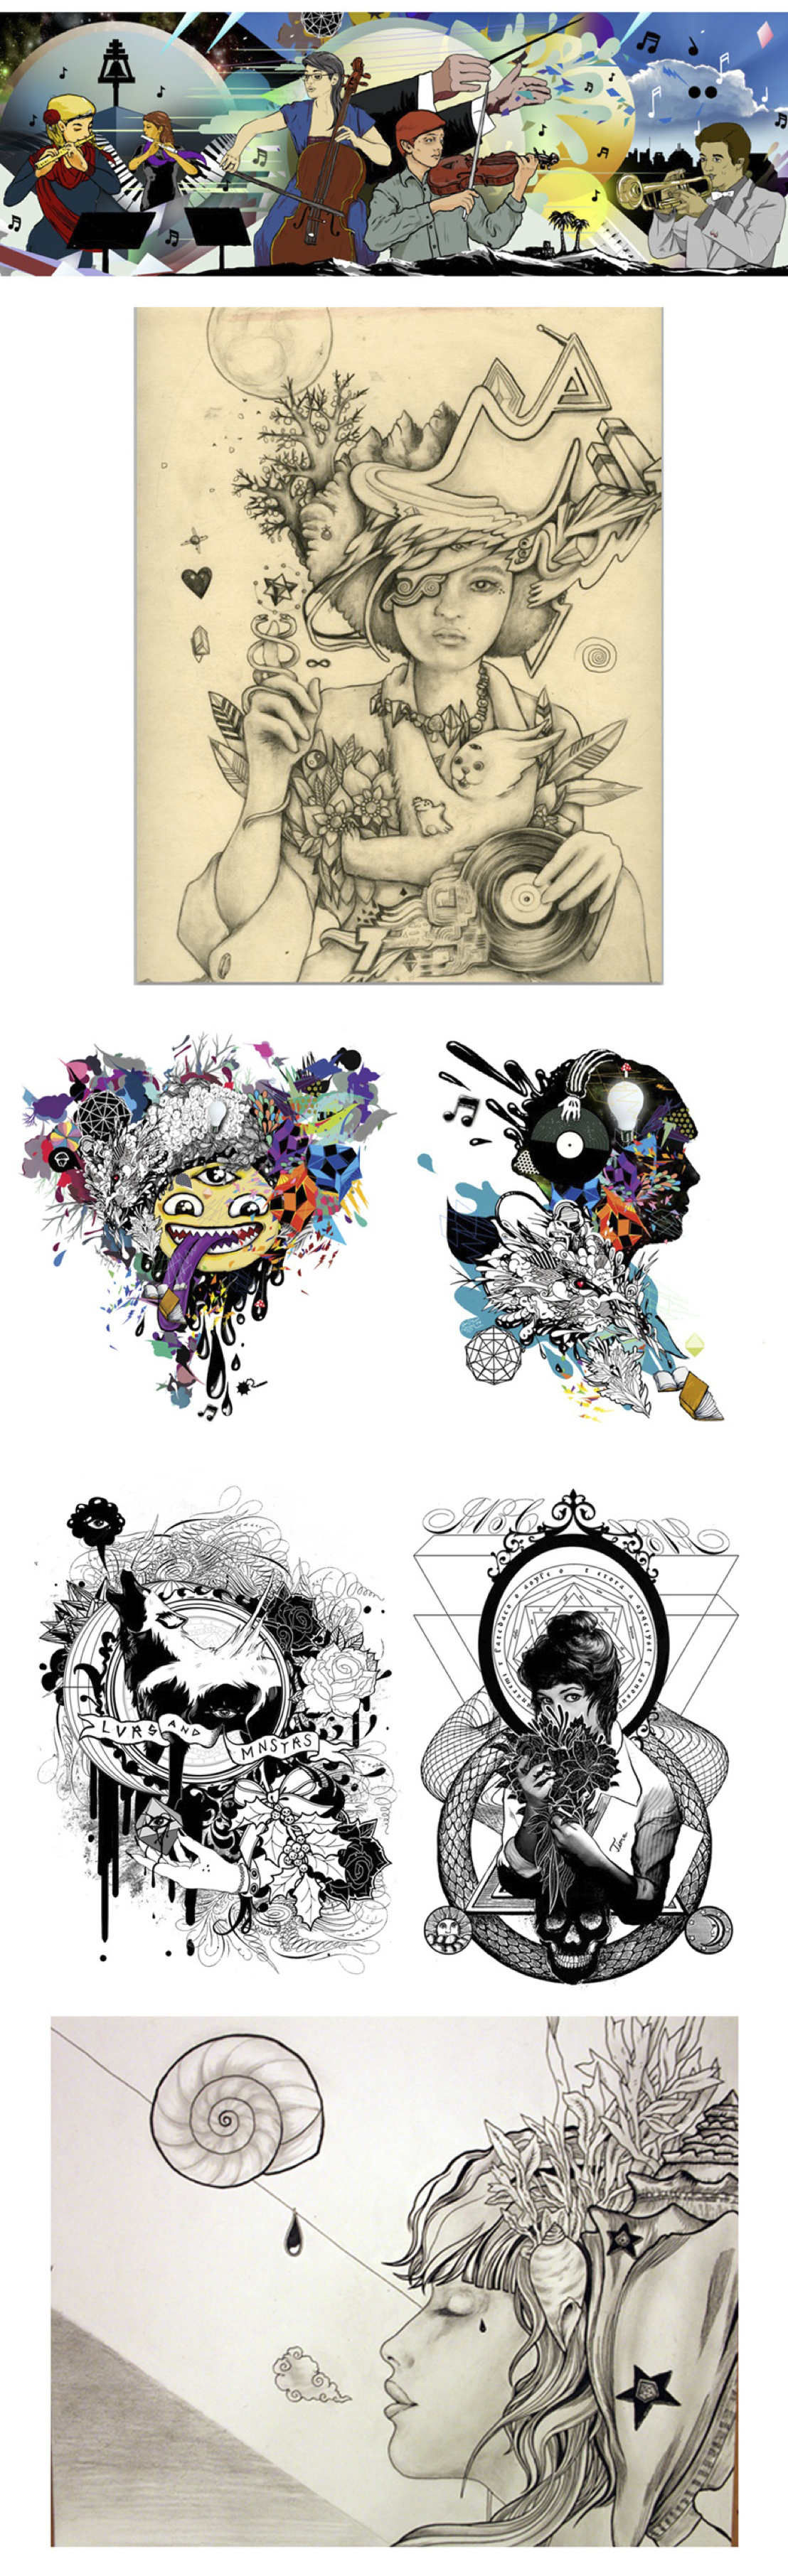 rgb_vn_Dan_Nguyen-art-13-7